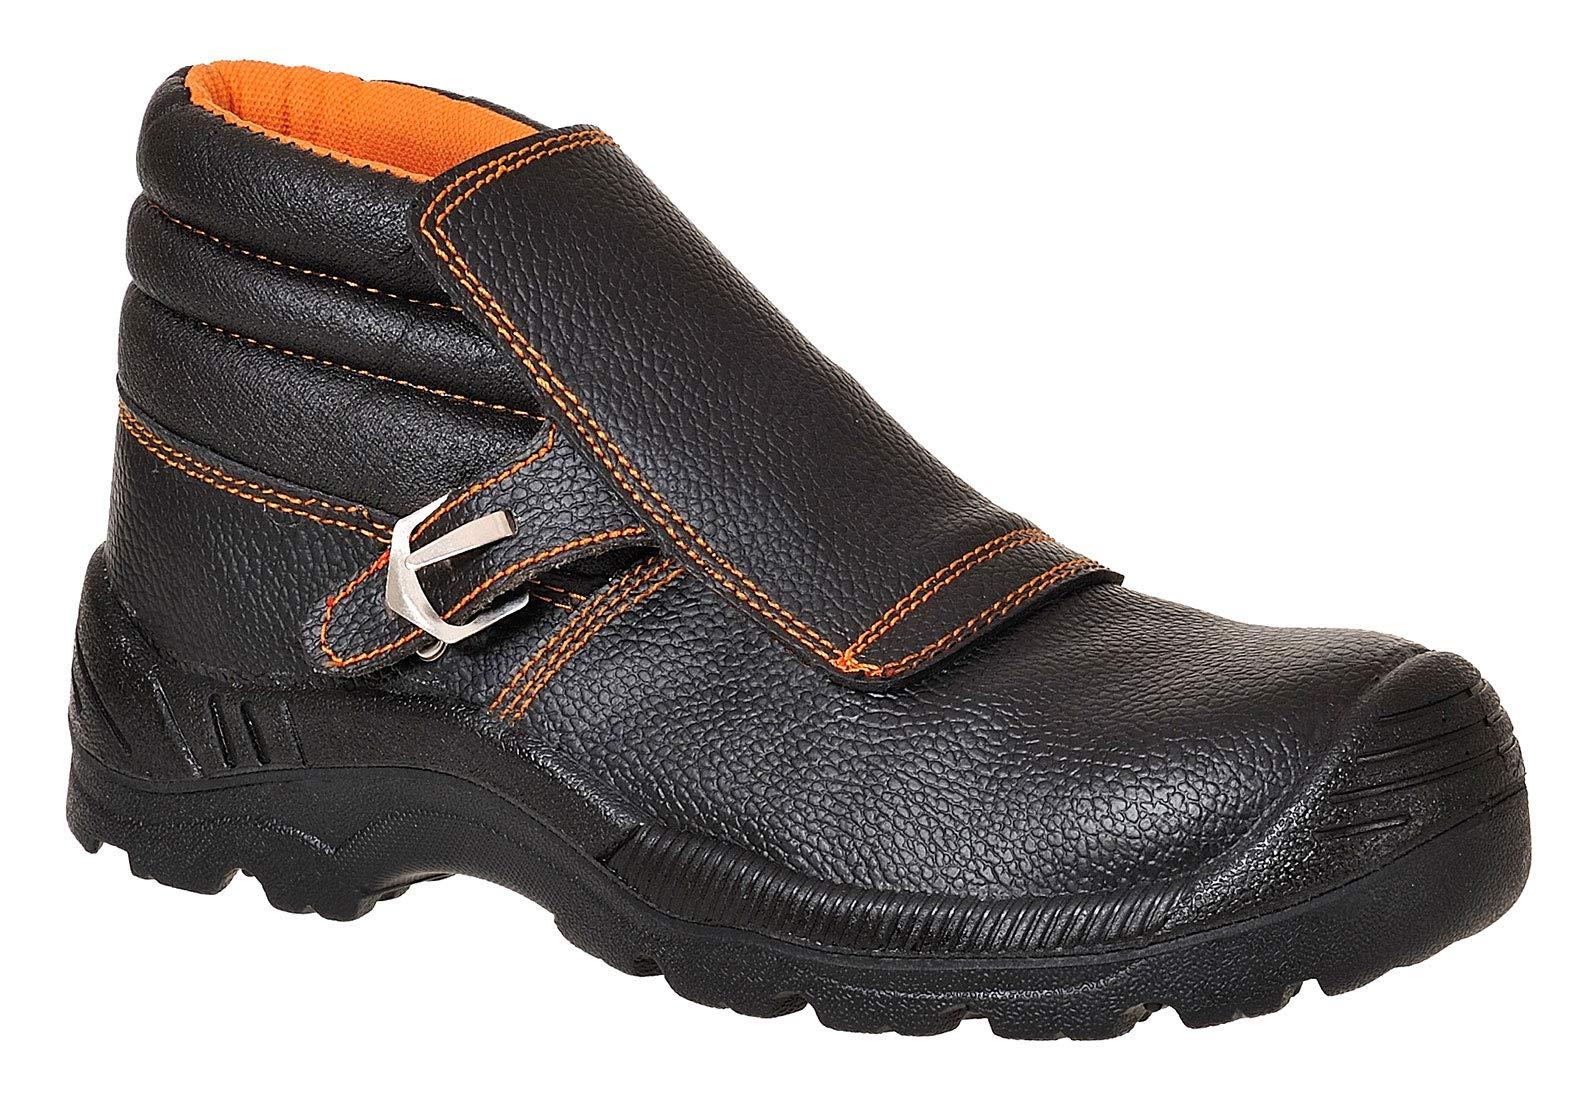 Portwest FW07BKR42 Compositelite Welders Boot, US Size 9 Split Leather, Black